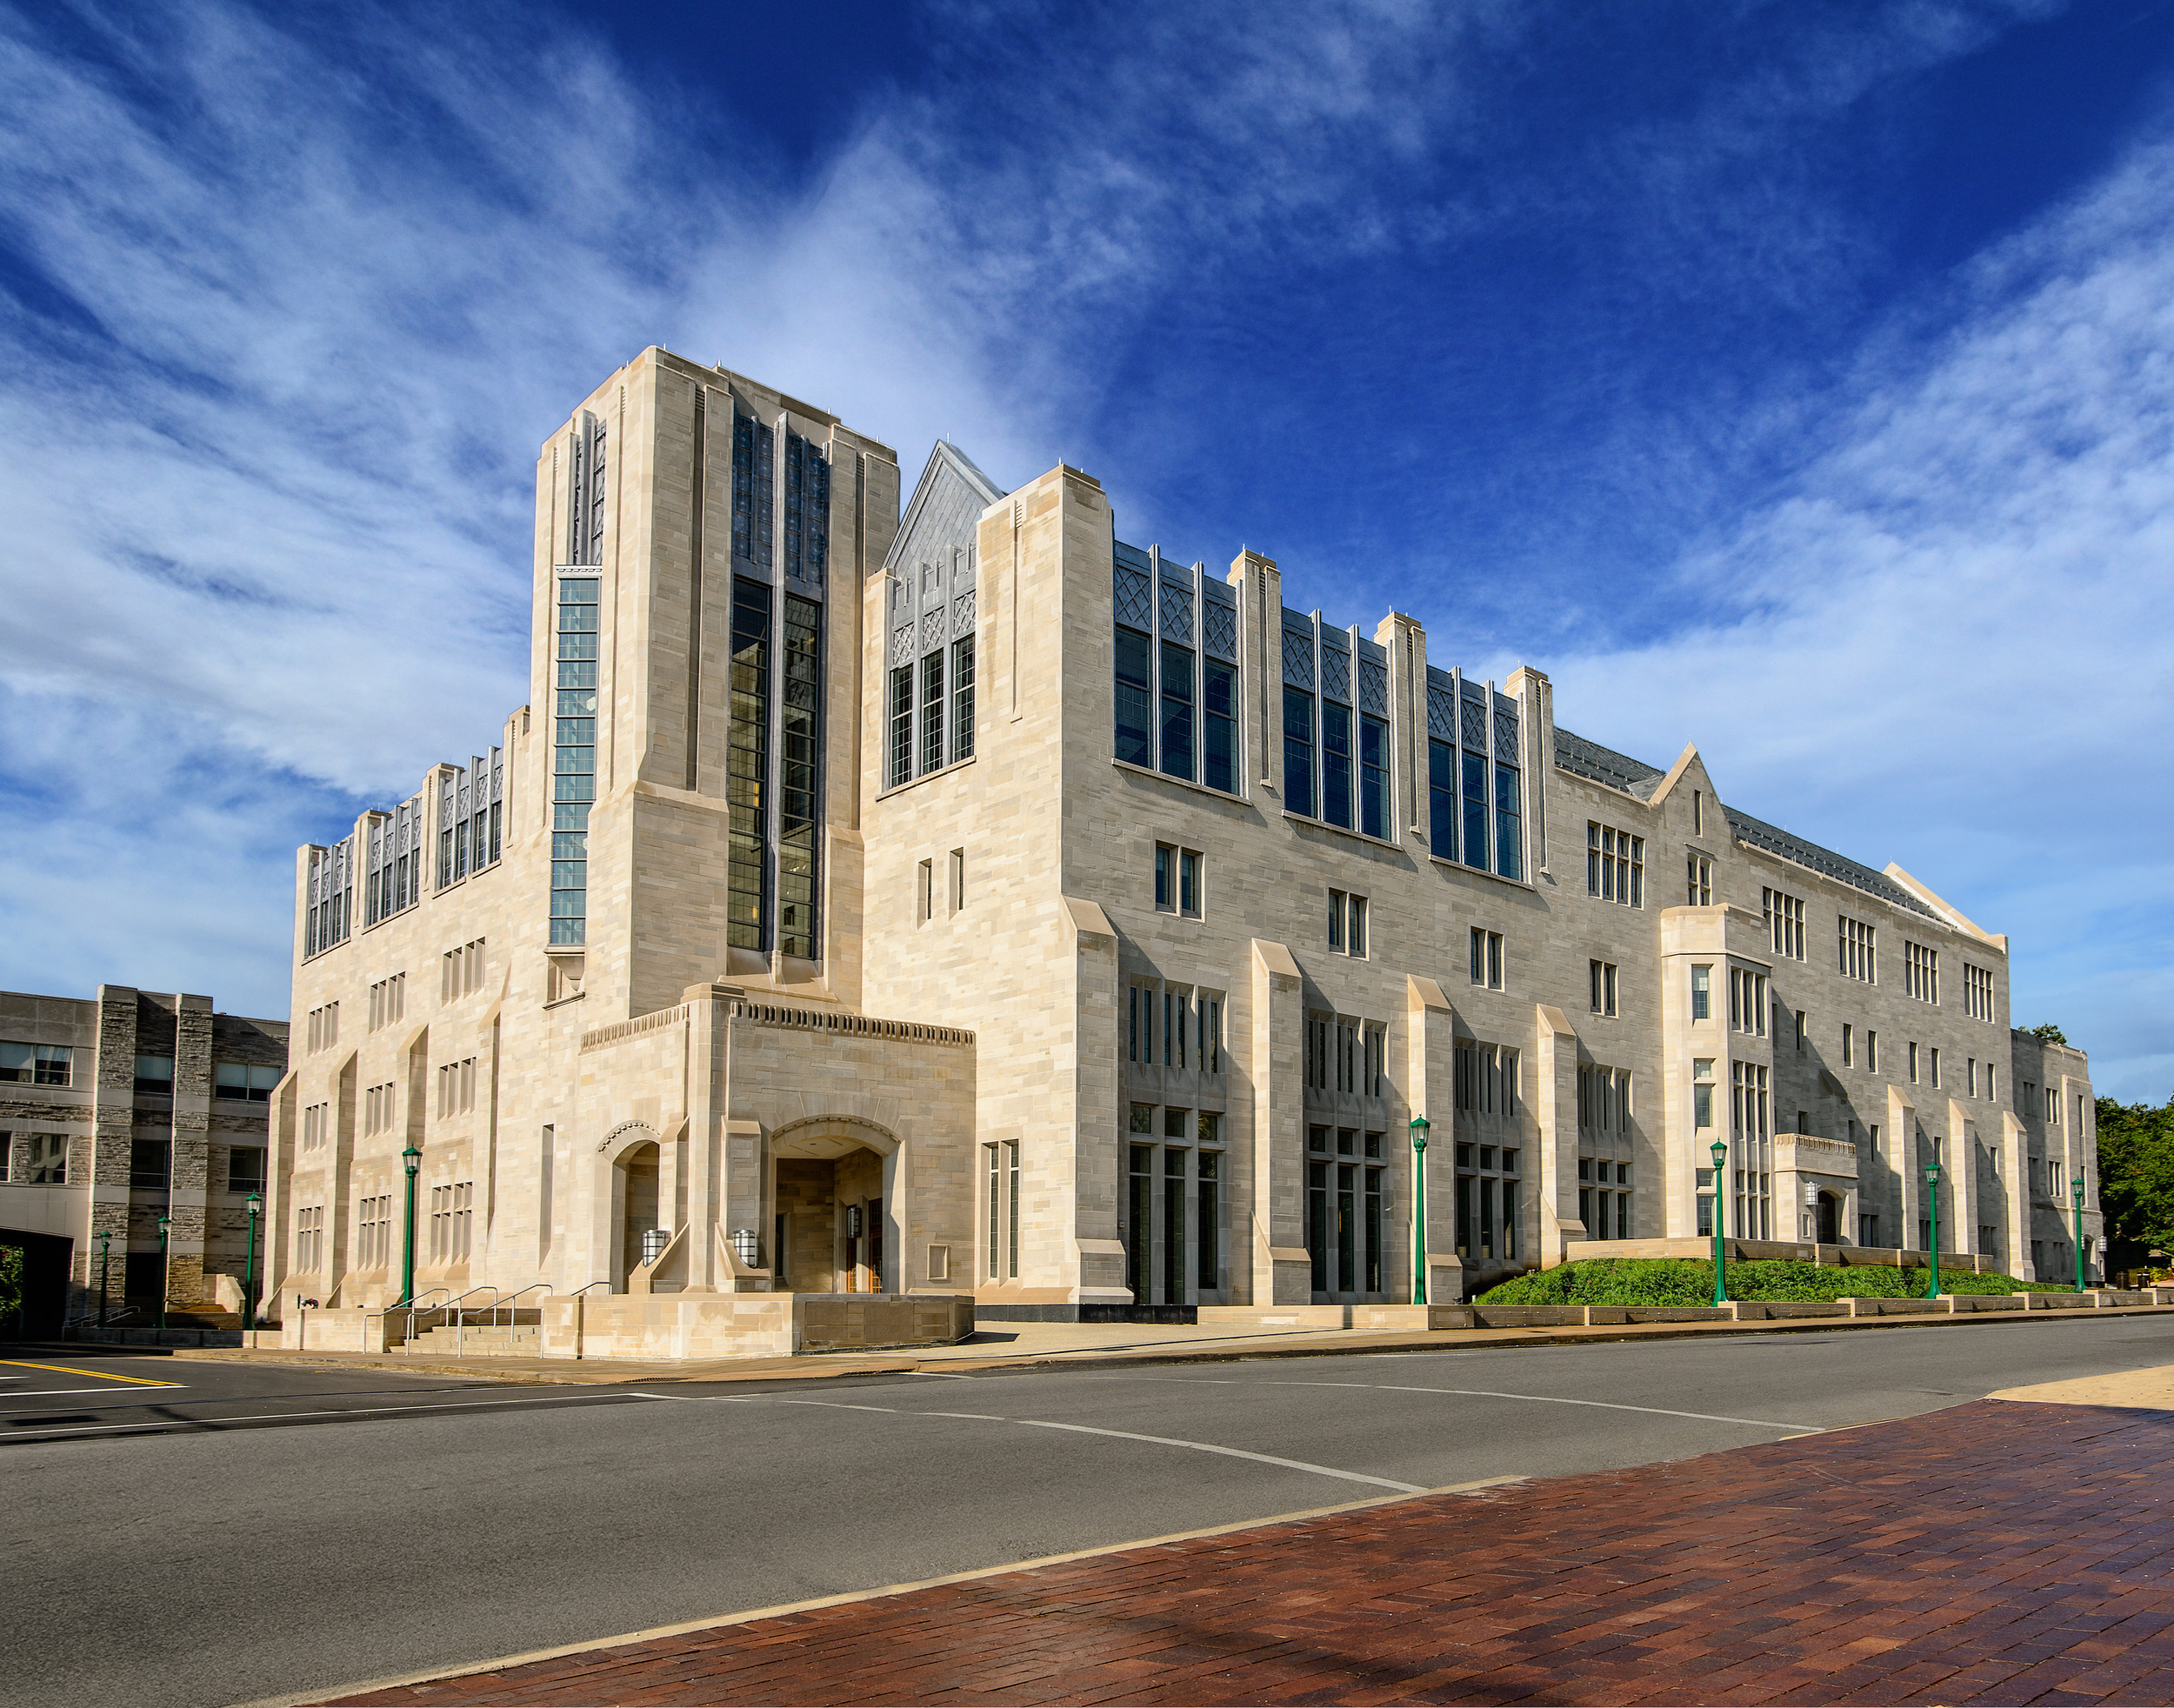 Indiana University Kelley School of Business - Hodge Hall